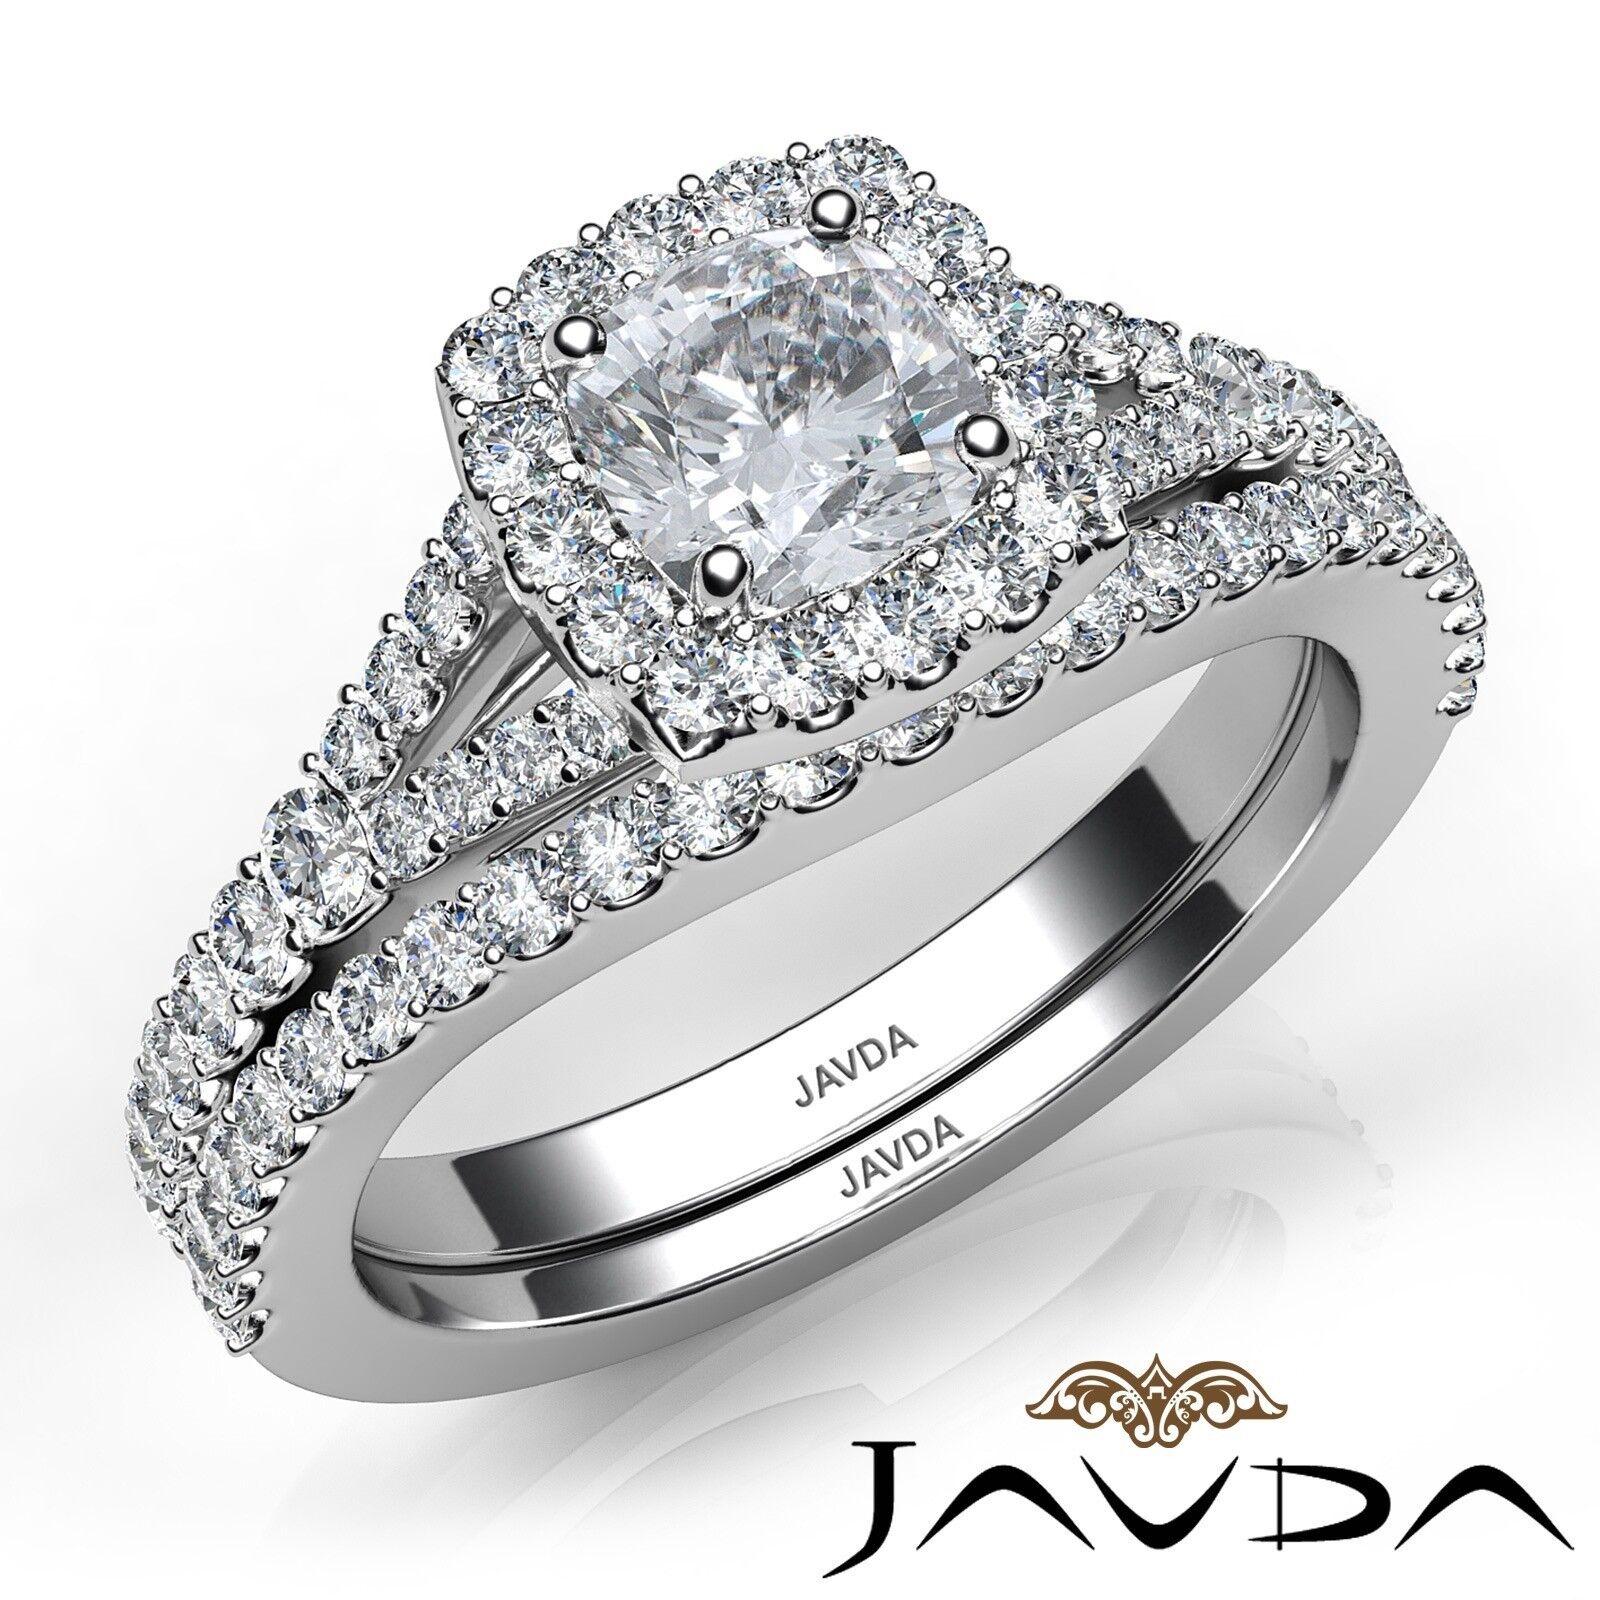 1.5ctw U Cut Pave Halo Bridal Cushion Diamond Engagement Ring GIA F-VS2 W Gold 1